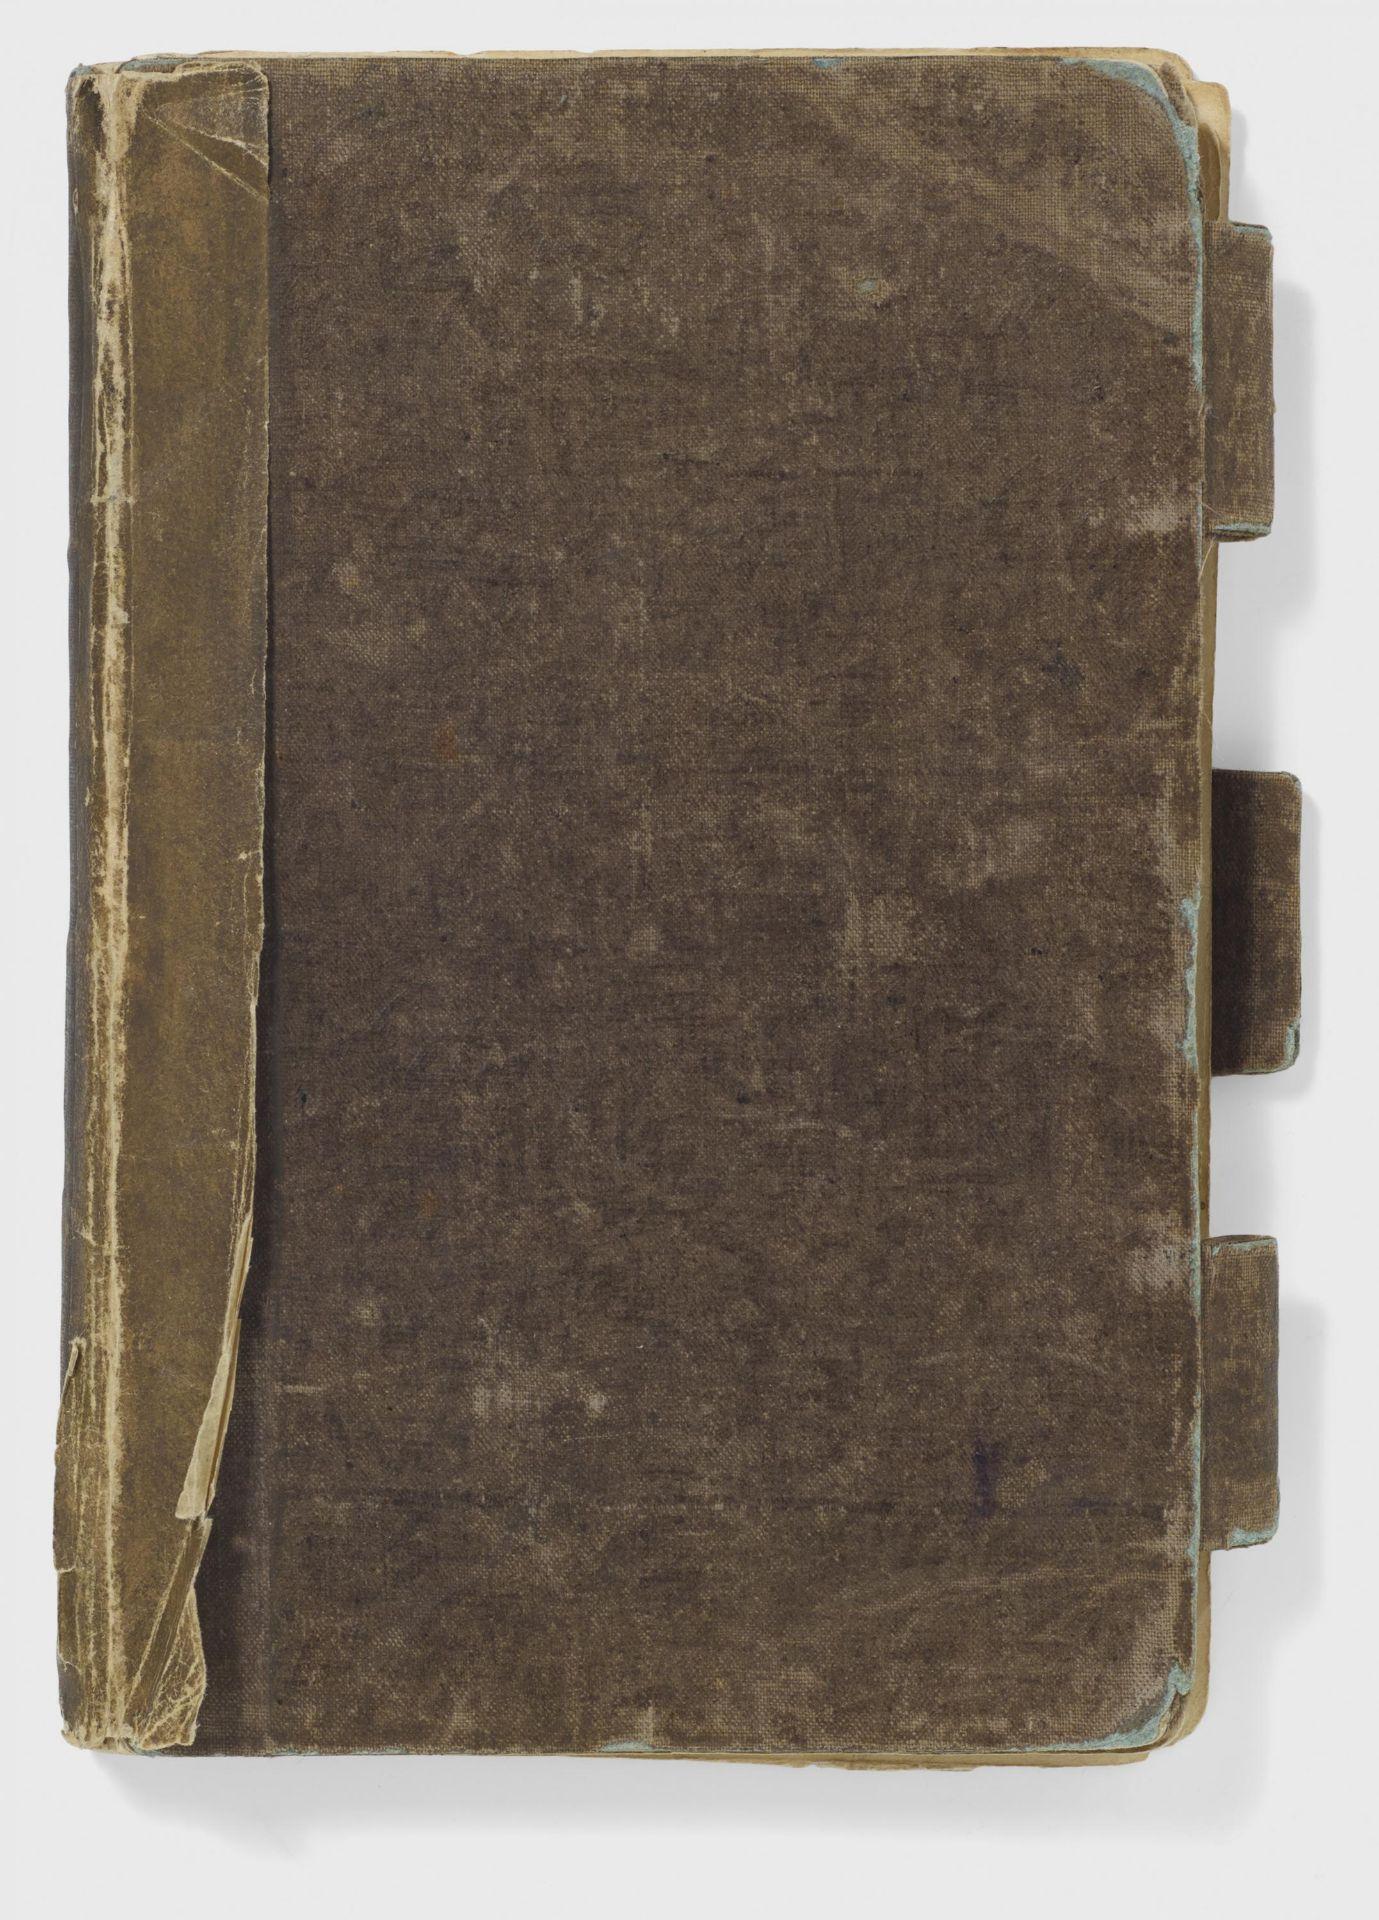 Kaupert, Gustav Kassel 1819 - 1897  Sketchbook, ca. 50 pages. Architecture, Italian landscapes - Bild 2 aus 6